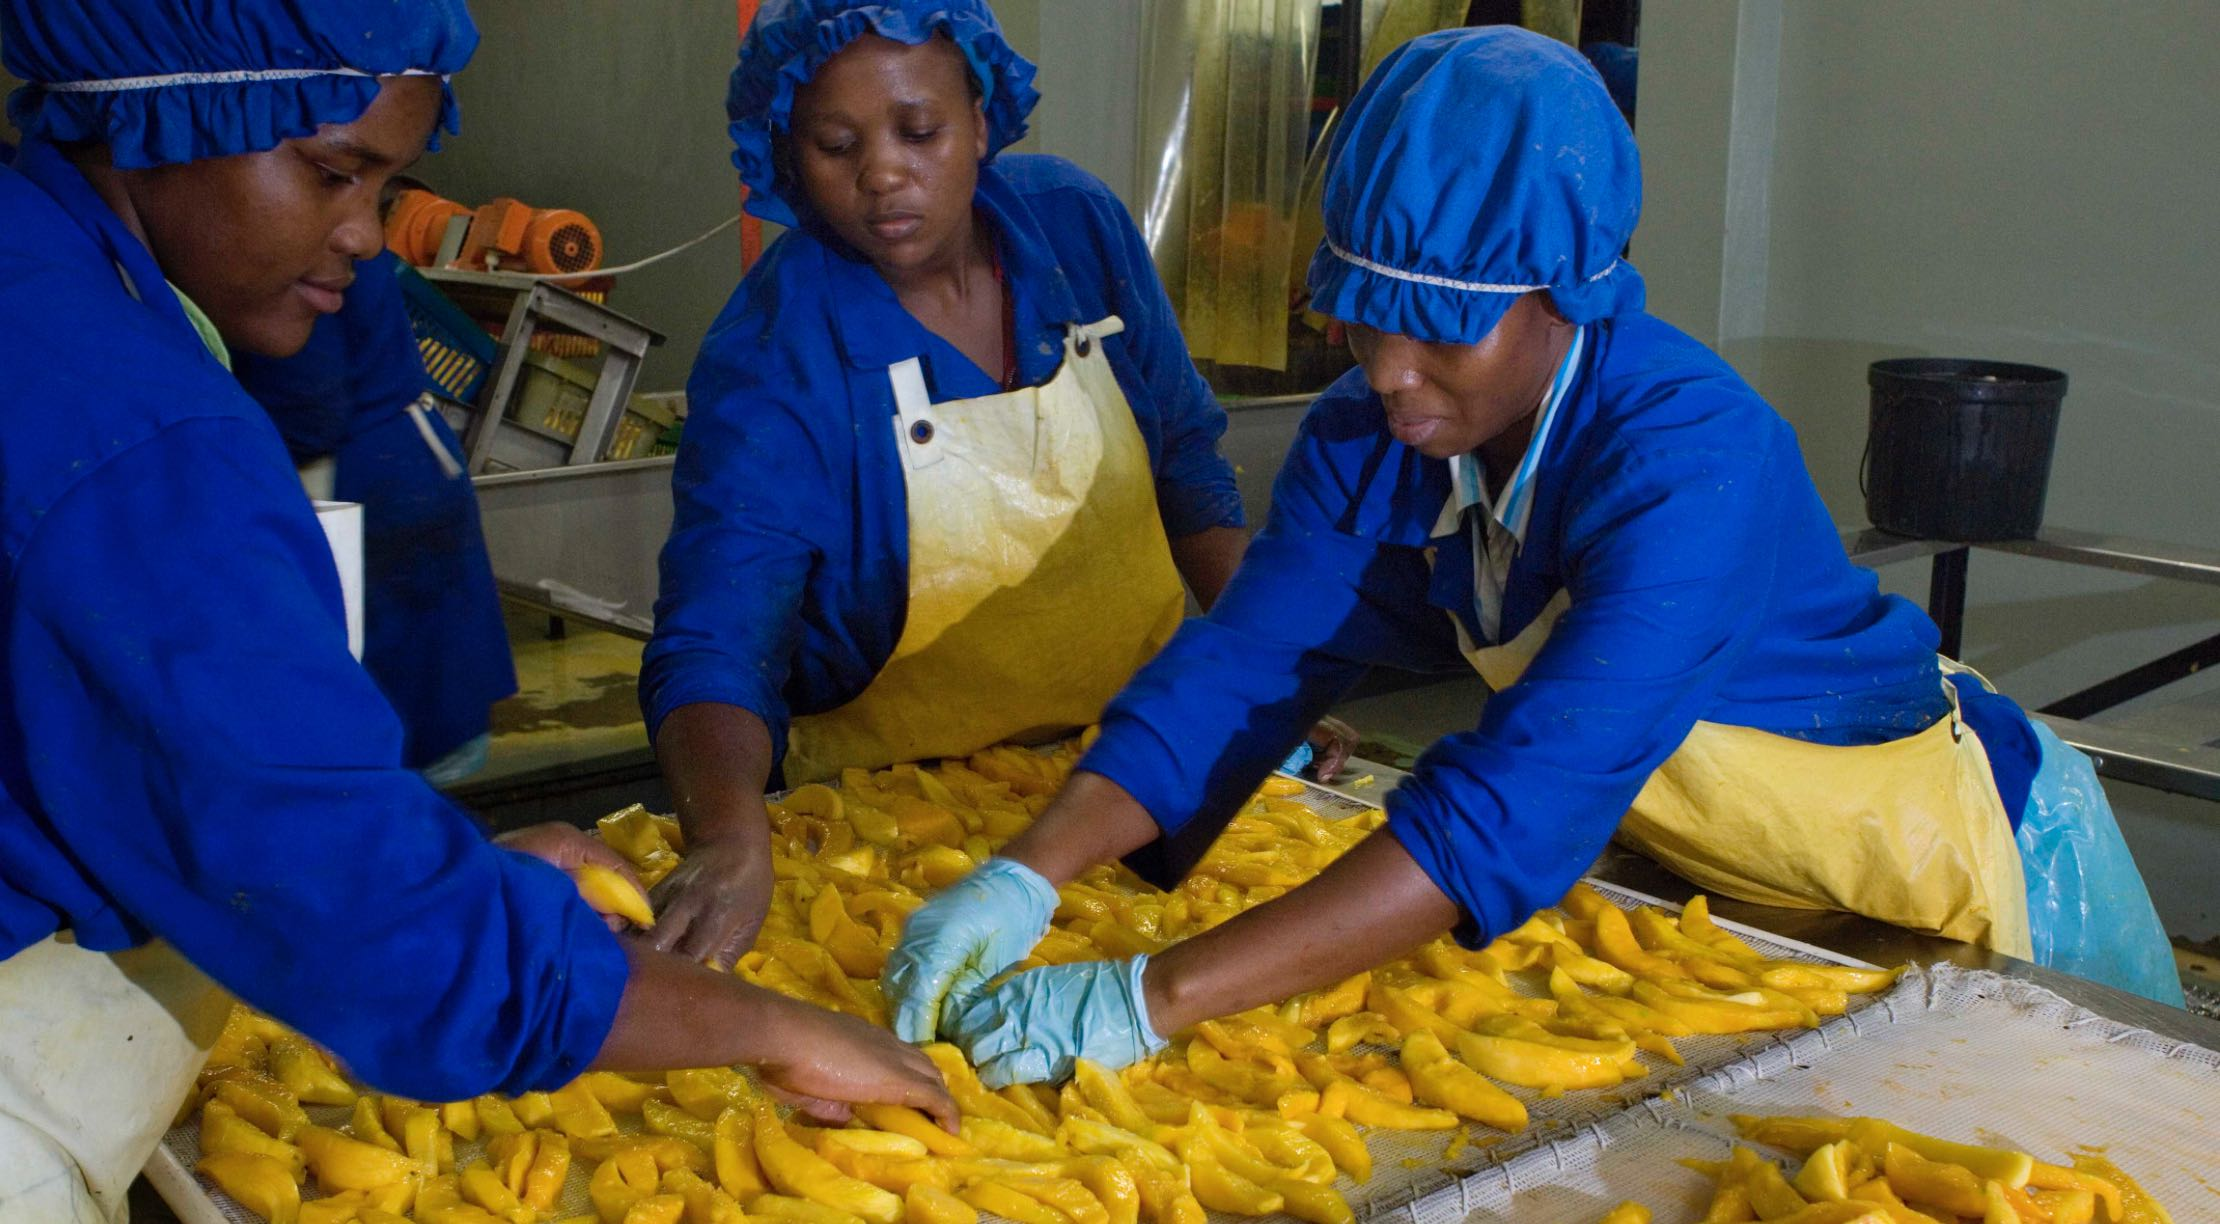 Food Production Entrepreneur : https://www.lionessesofafrica.com